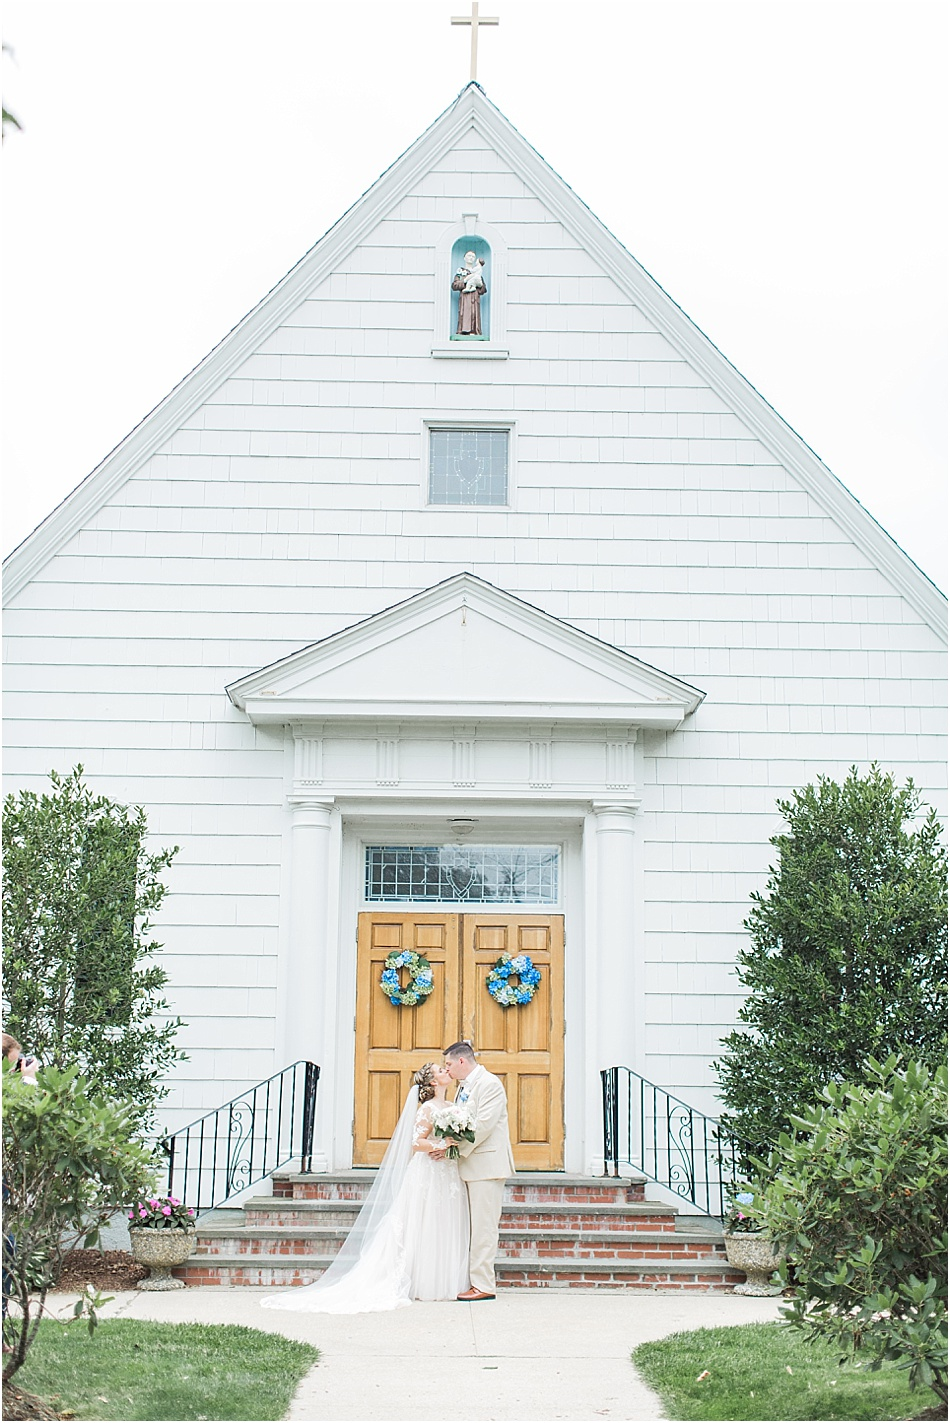 brookside_country_club_cape_cod_boston_wedding_photographer_Meredith_Jane_Photography_photo_0154.jpg